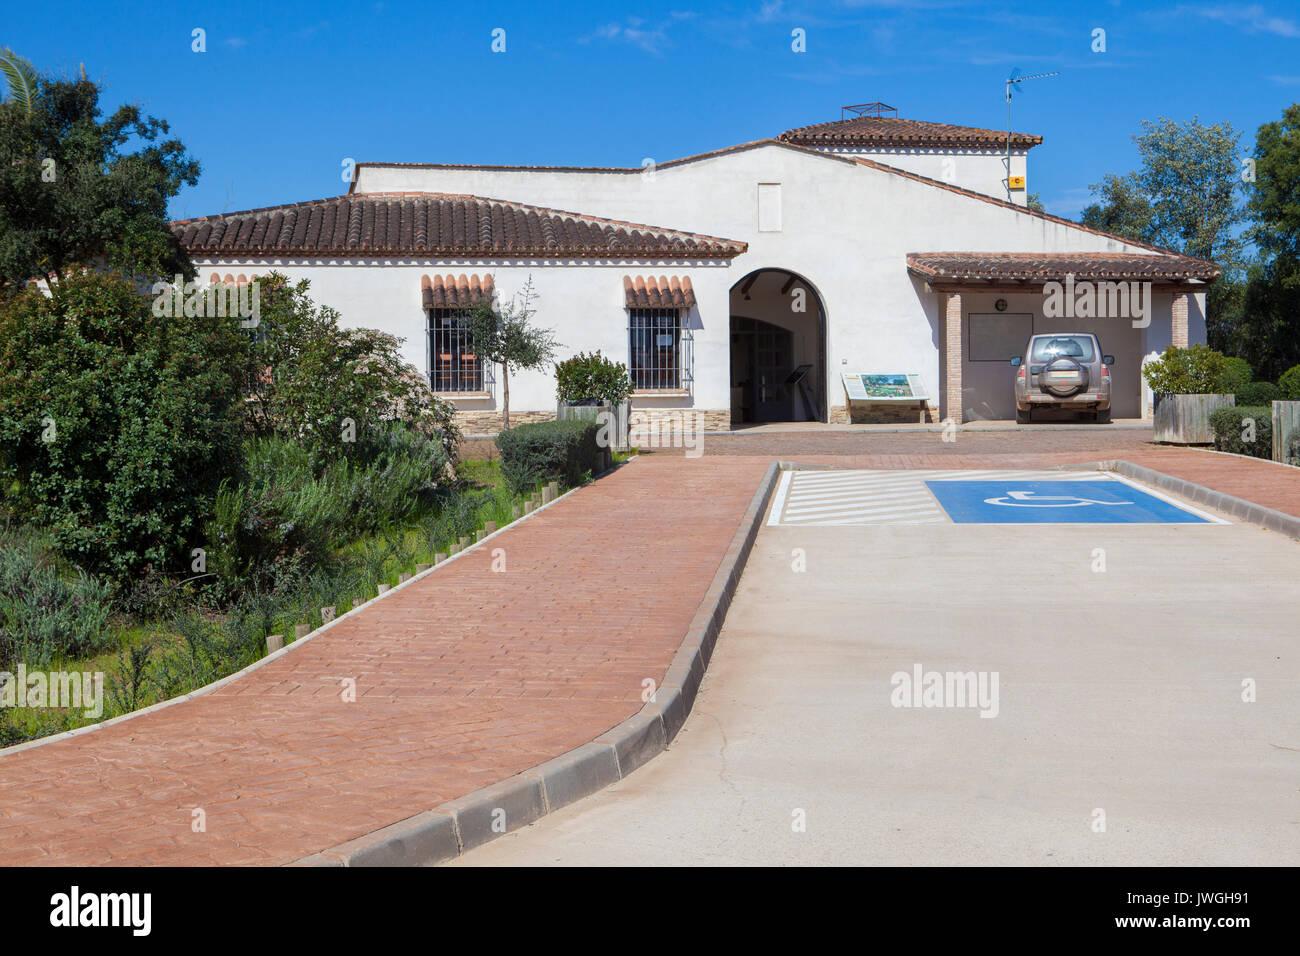 Trujillanos, Spain. March 15, 2017: Centre of visitors of  Cornalvo Natural Park, Trujillanos, Extremadura, Spain - Stock Image